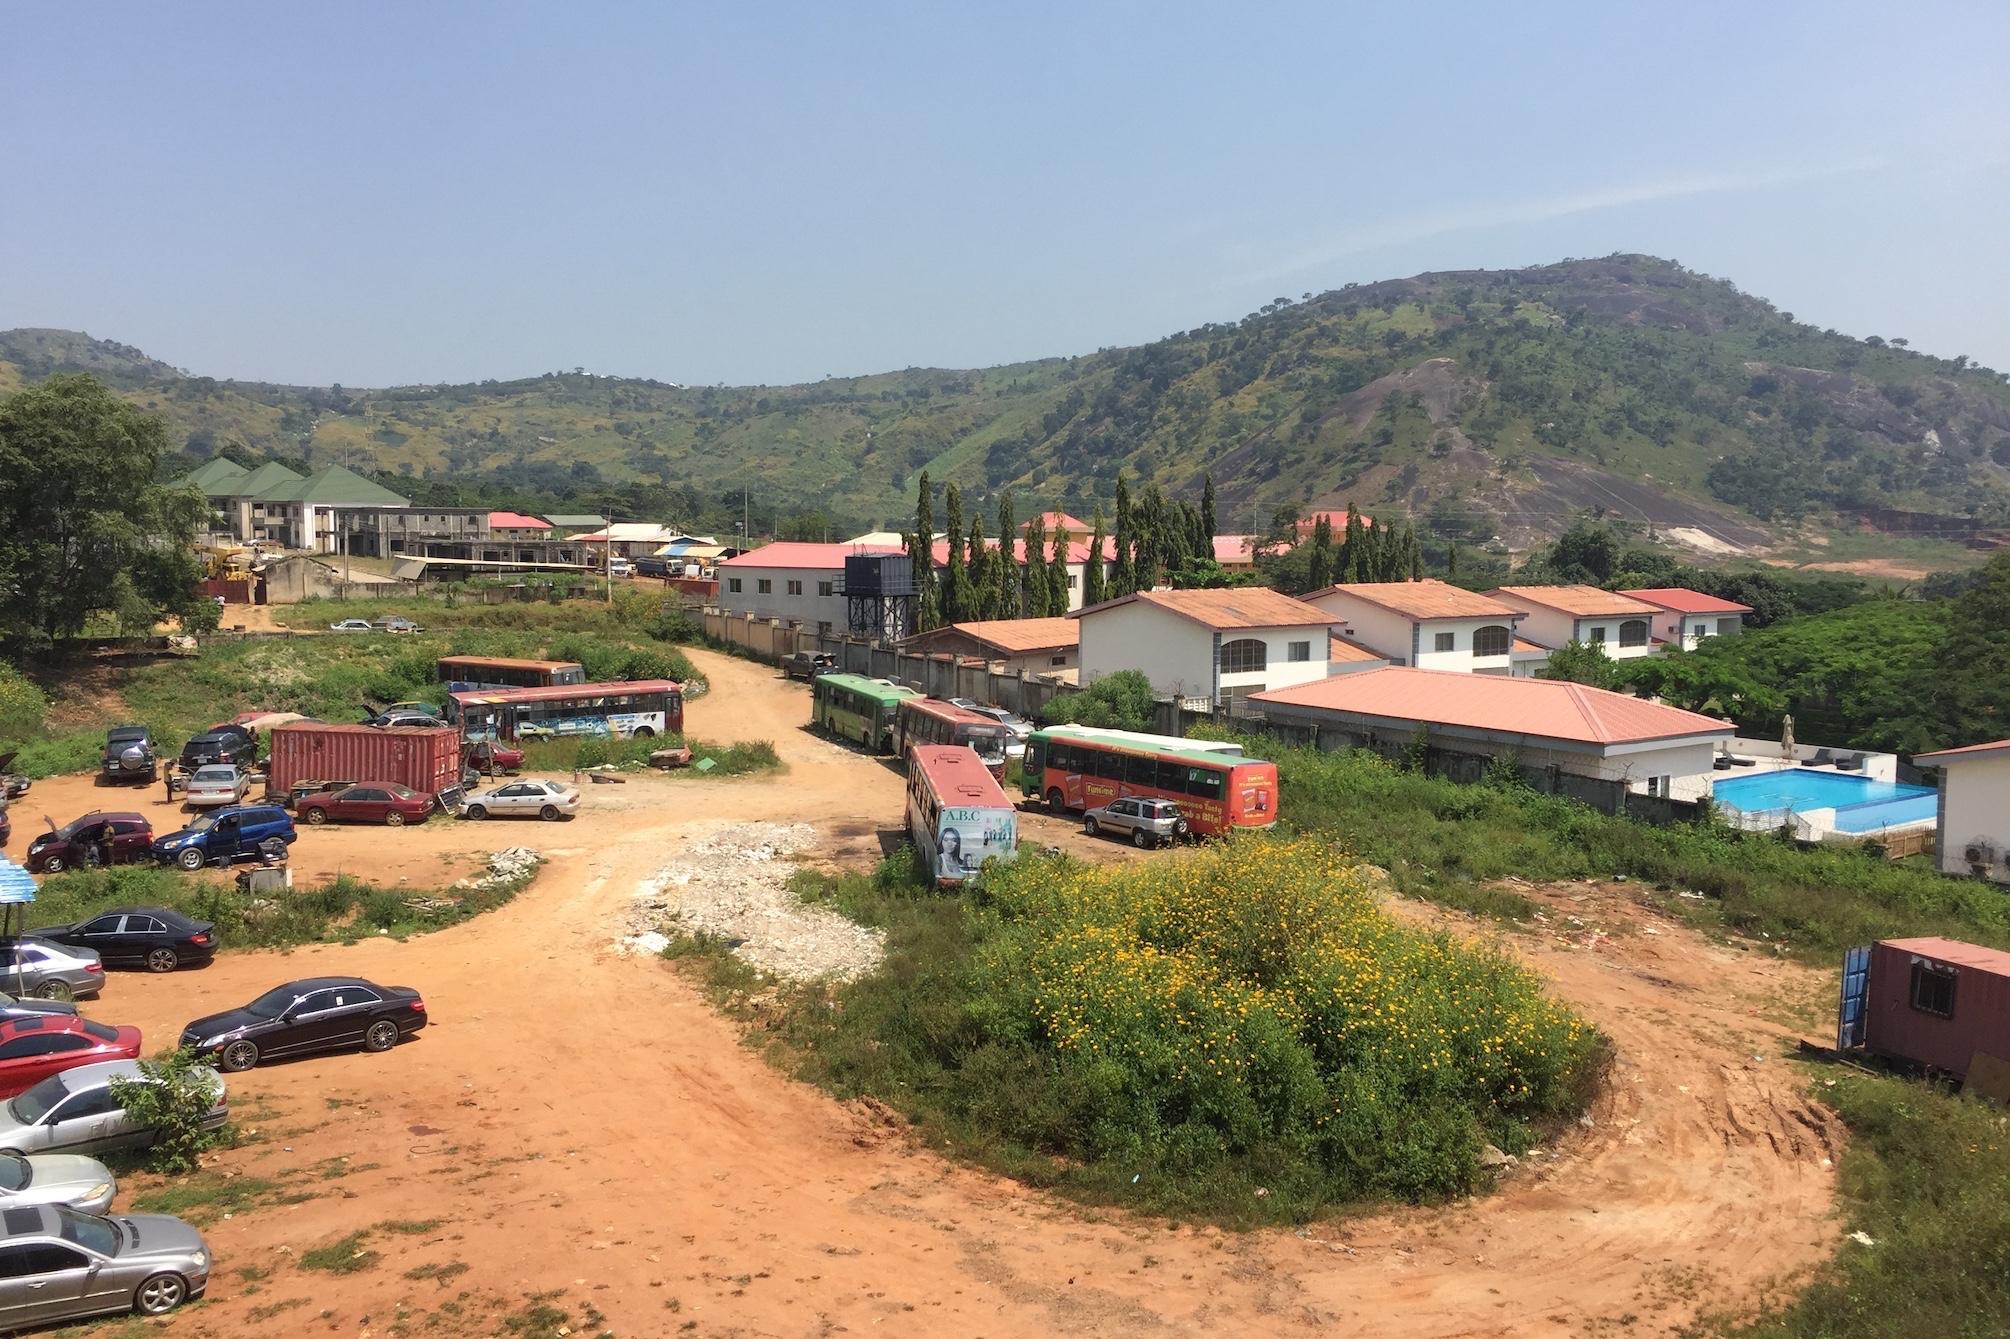 Neu in Nigeria - www.expatmamas.de/blog/ - #imauslandzuhause #expatmamas #nigeria